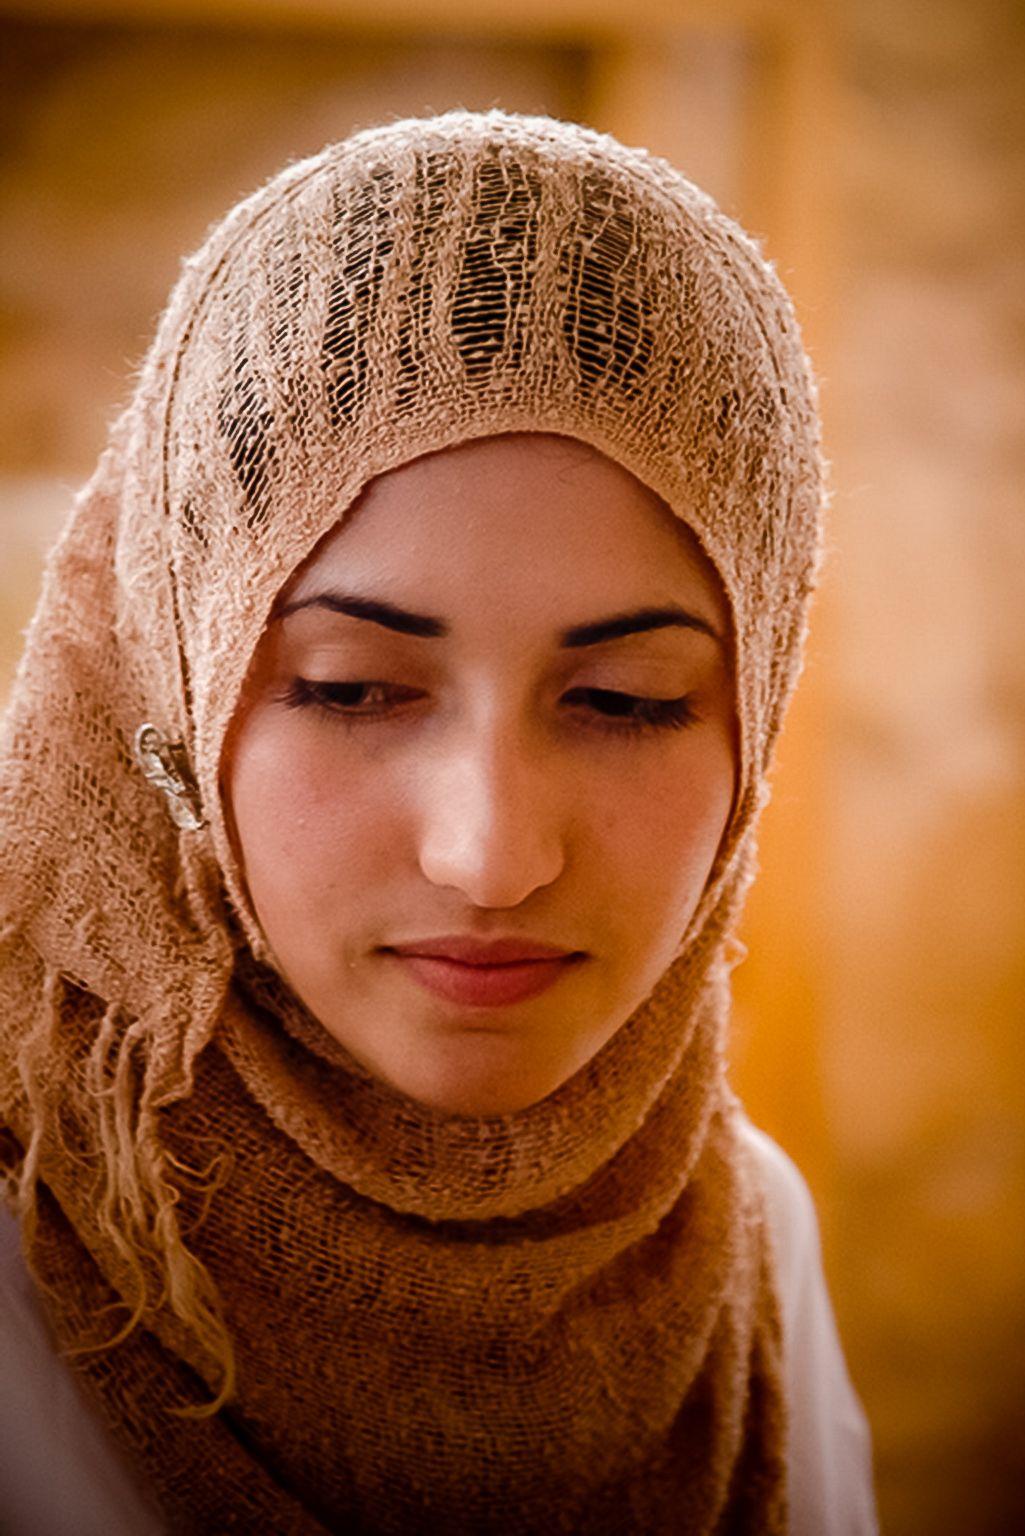 moroccan girl dating